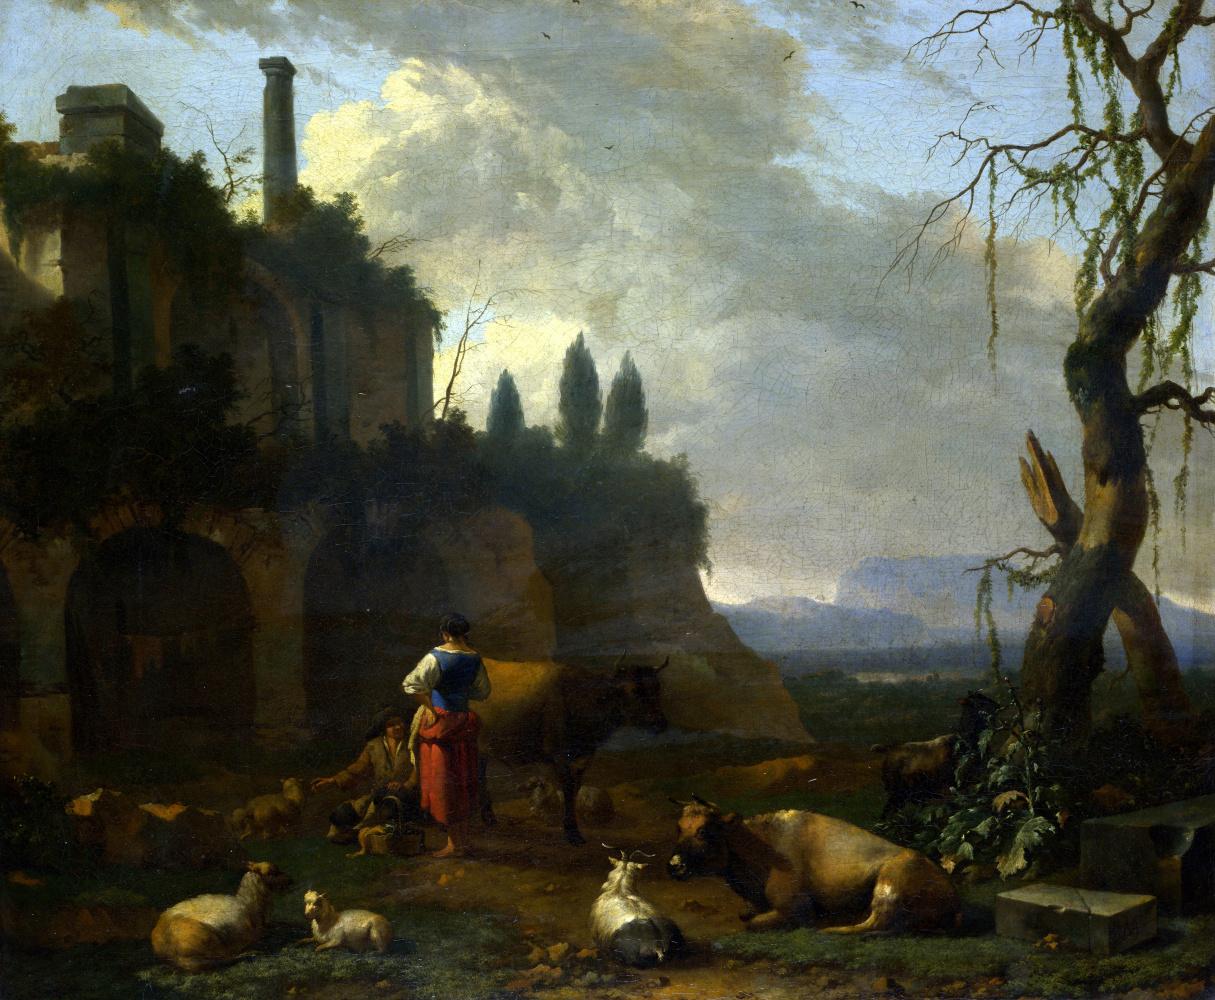 Абрахам Бегейн. Крестьяне среди крупного рогатого скота по Руина